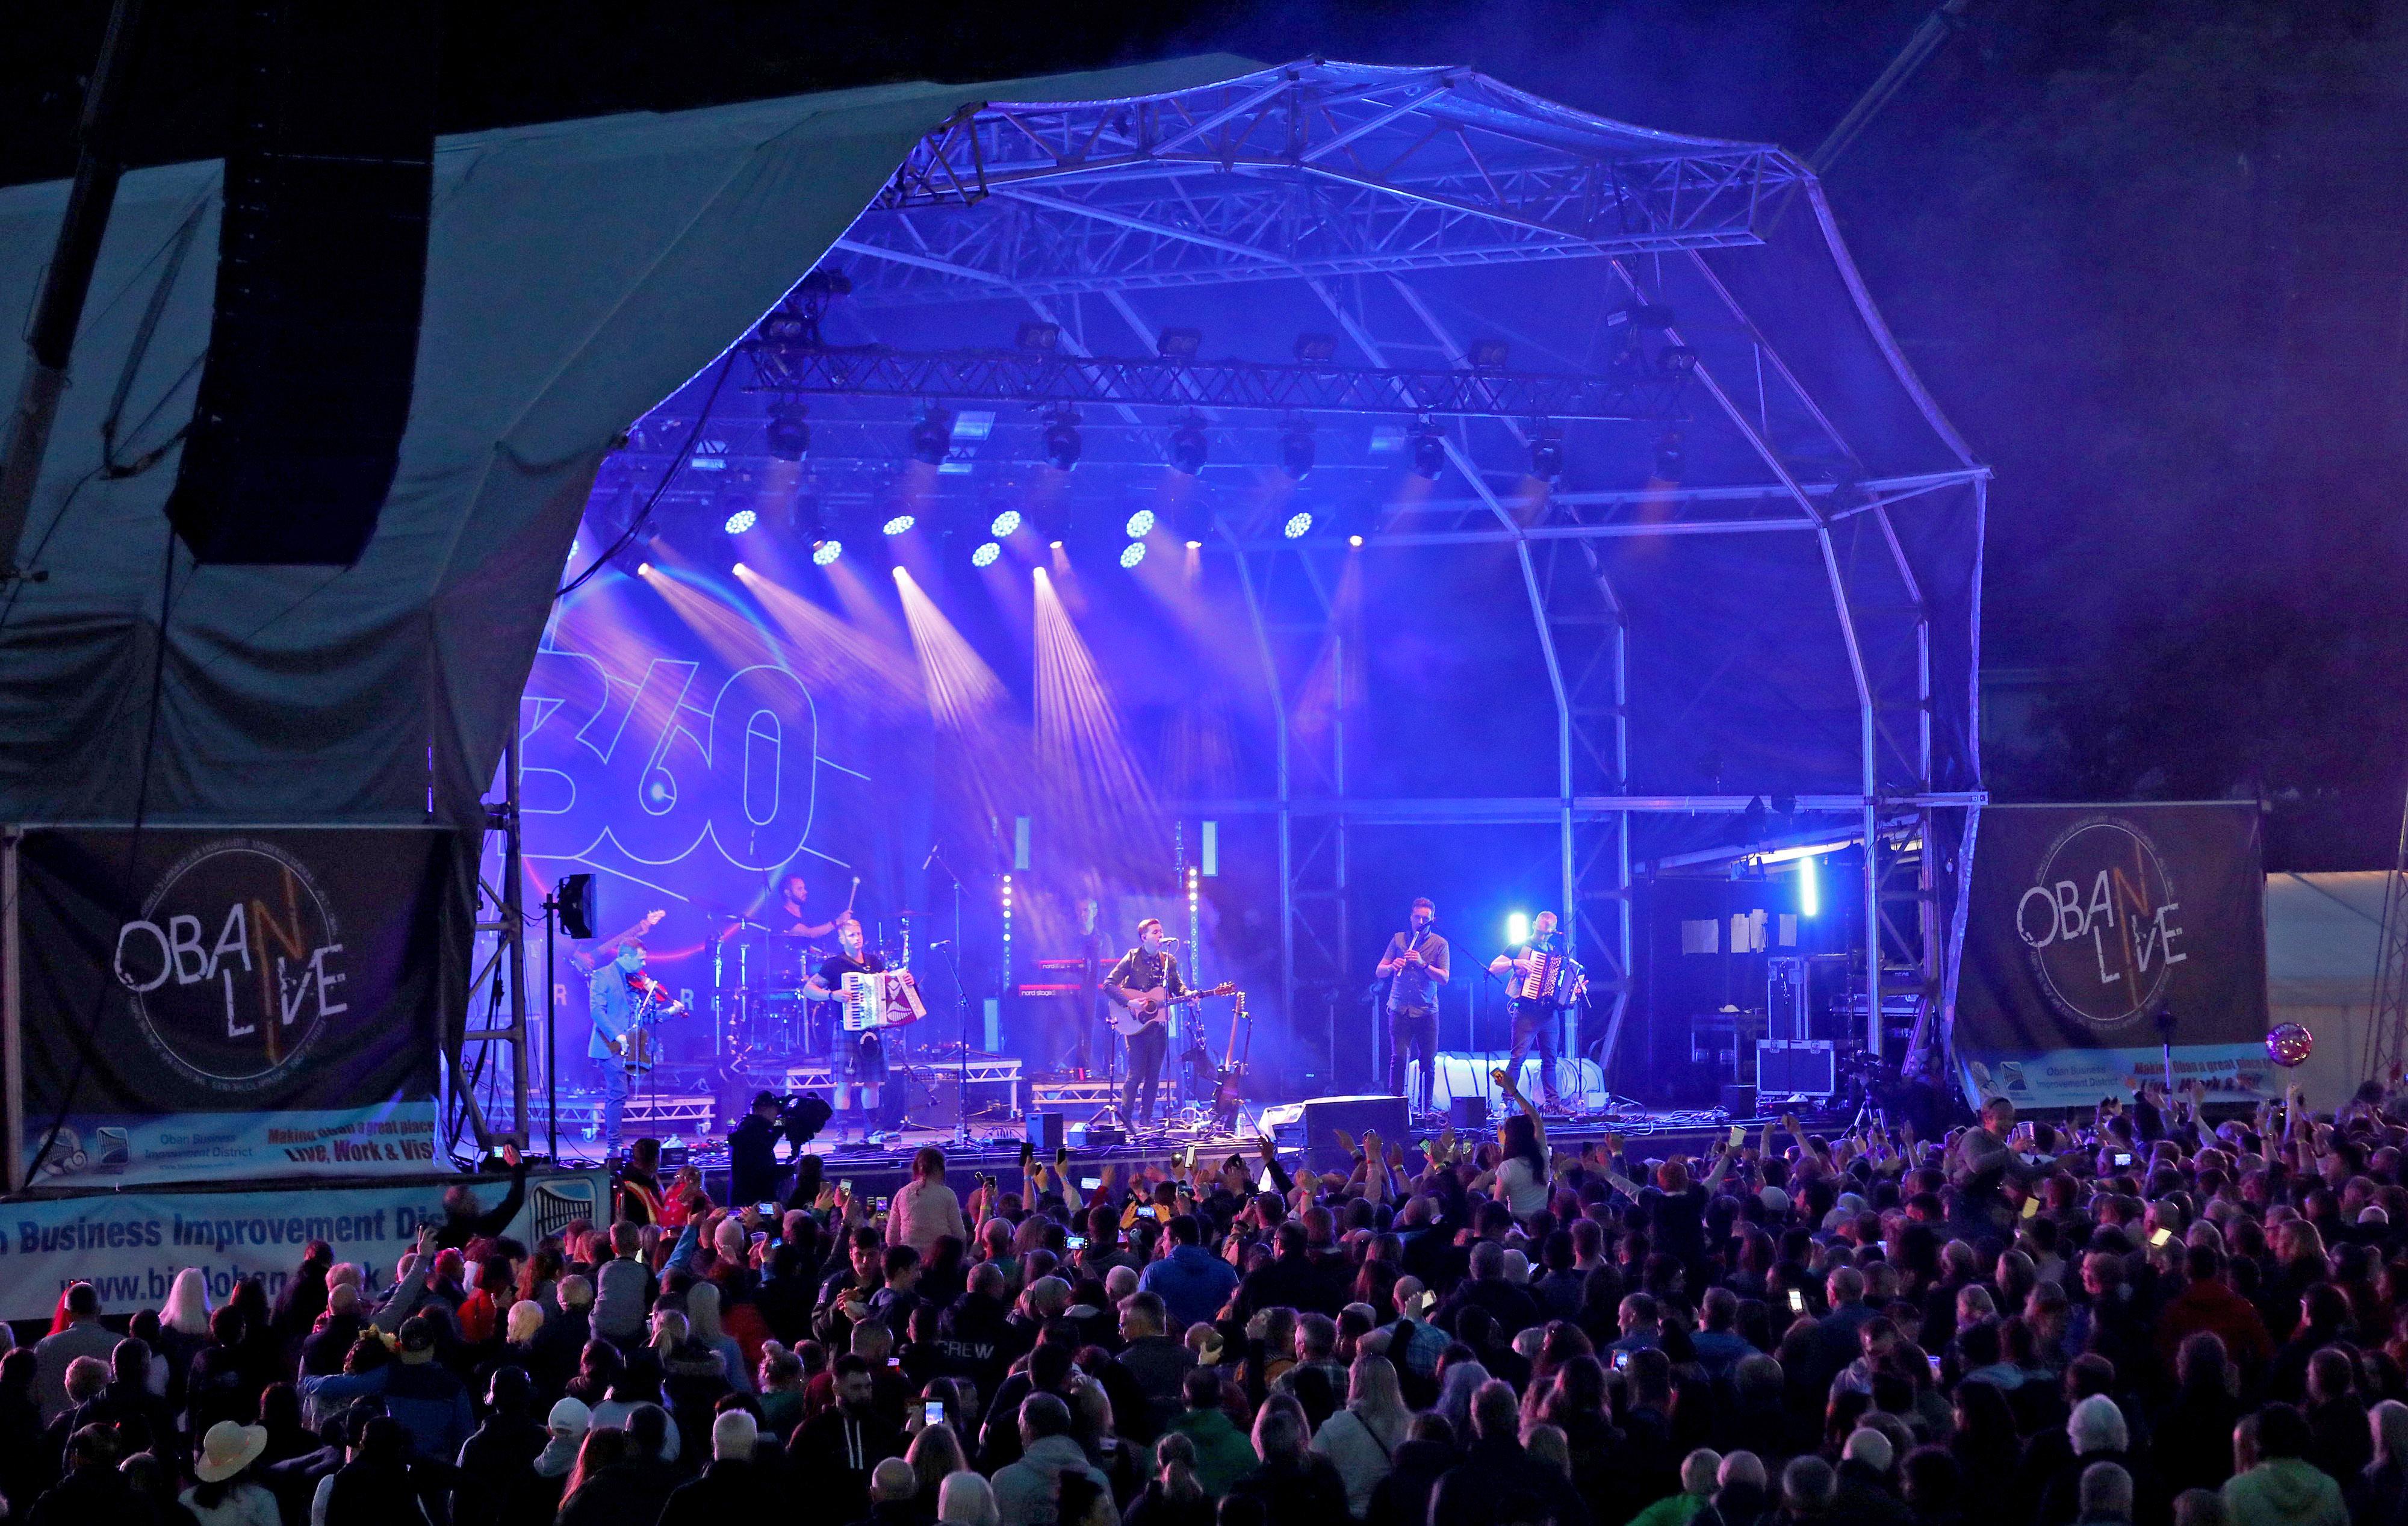 Skerryvore performing at Oban Live 2019